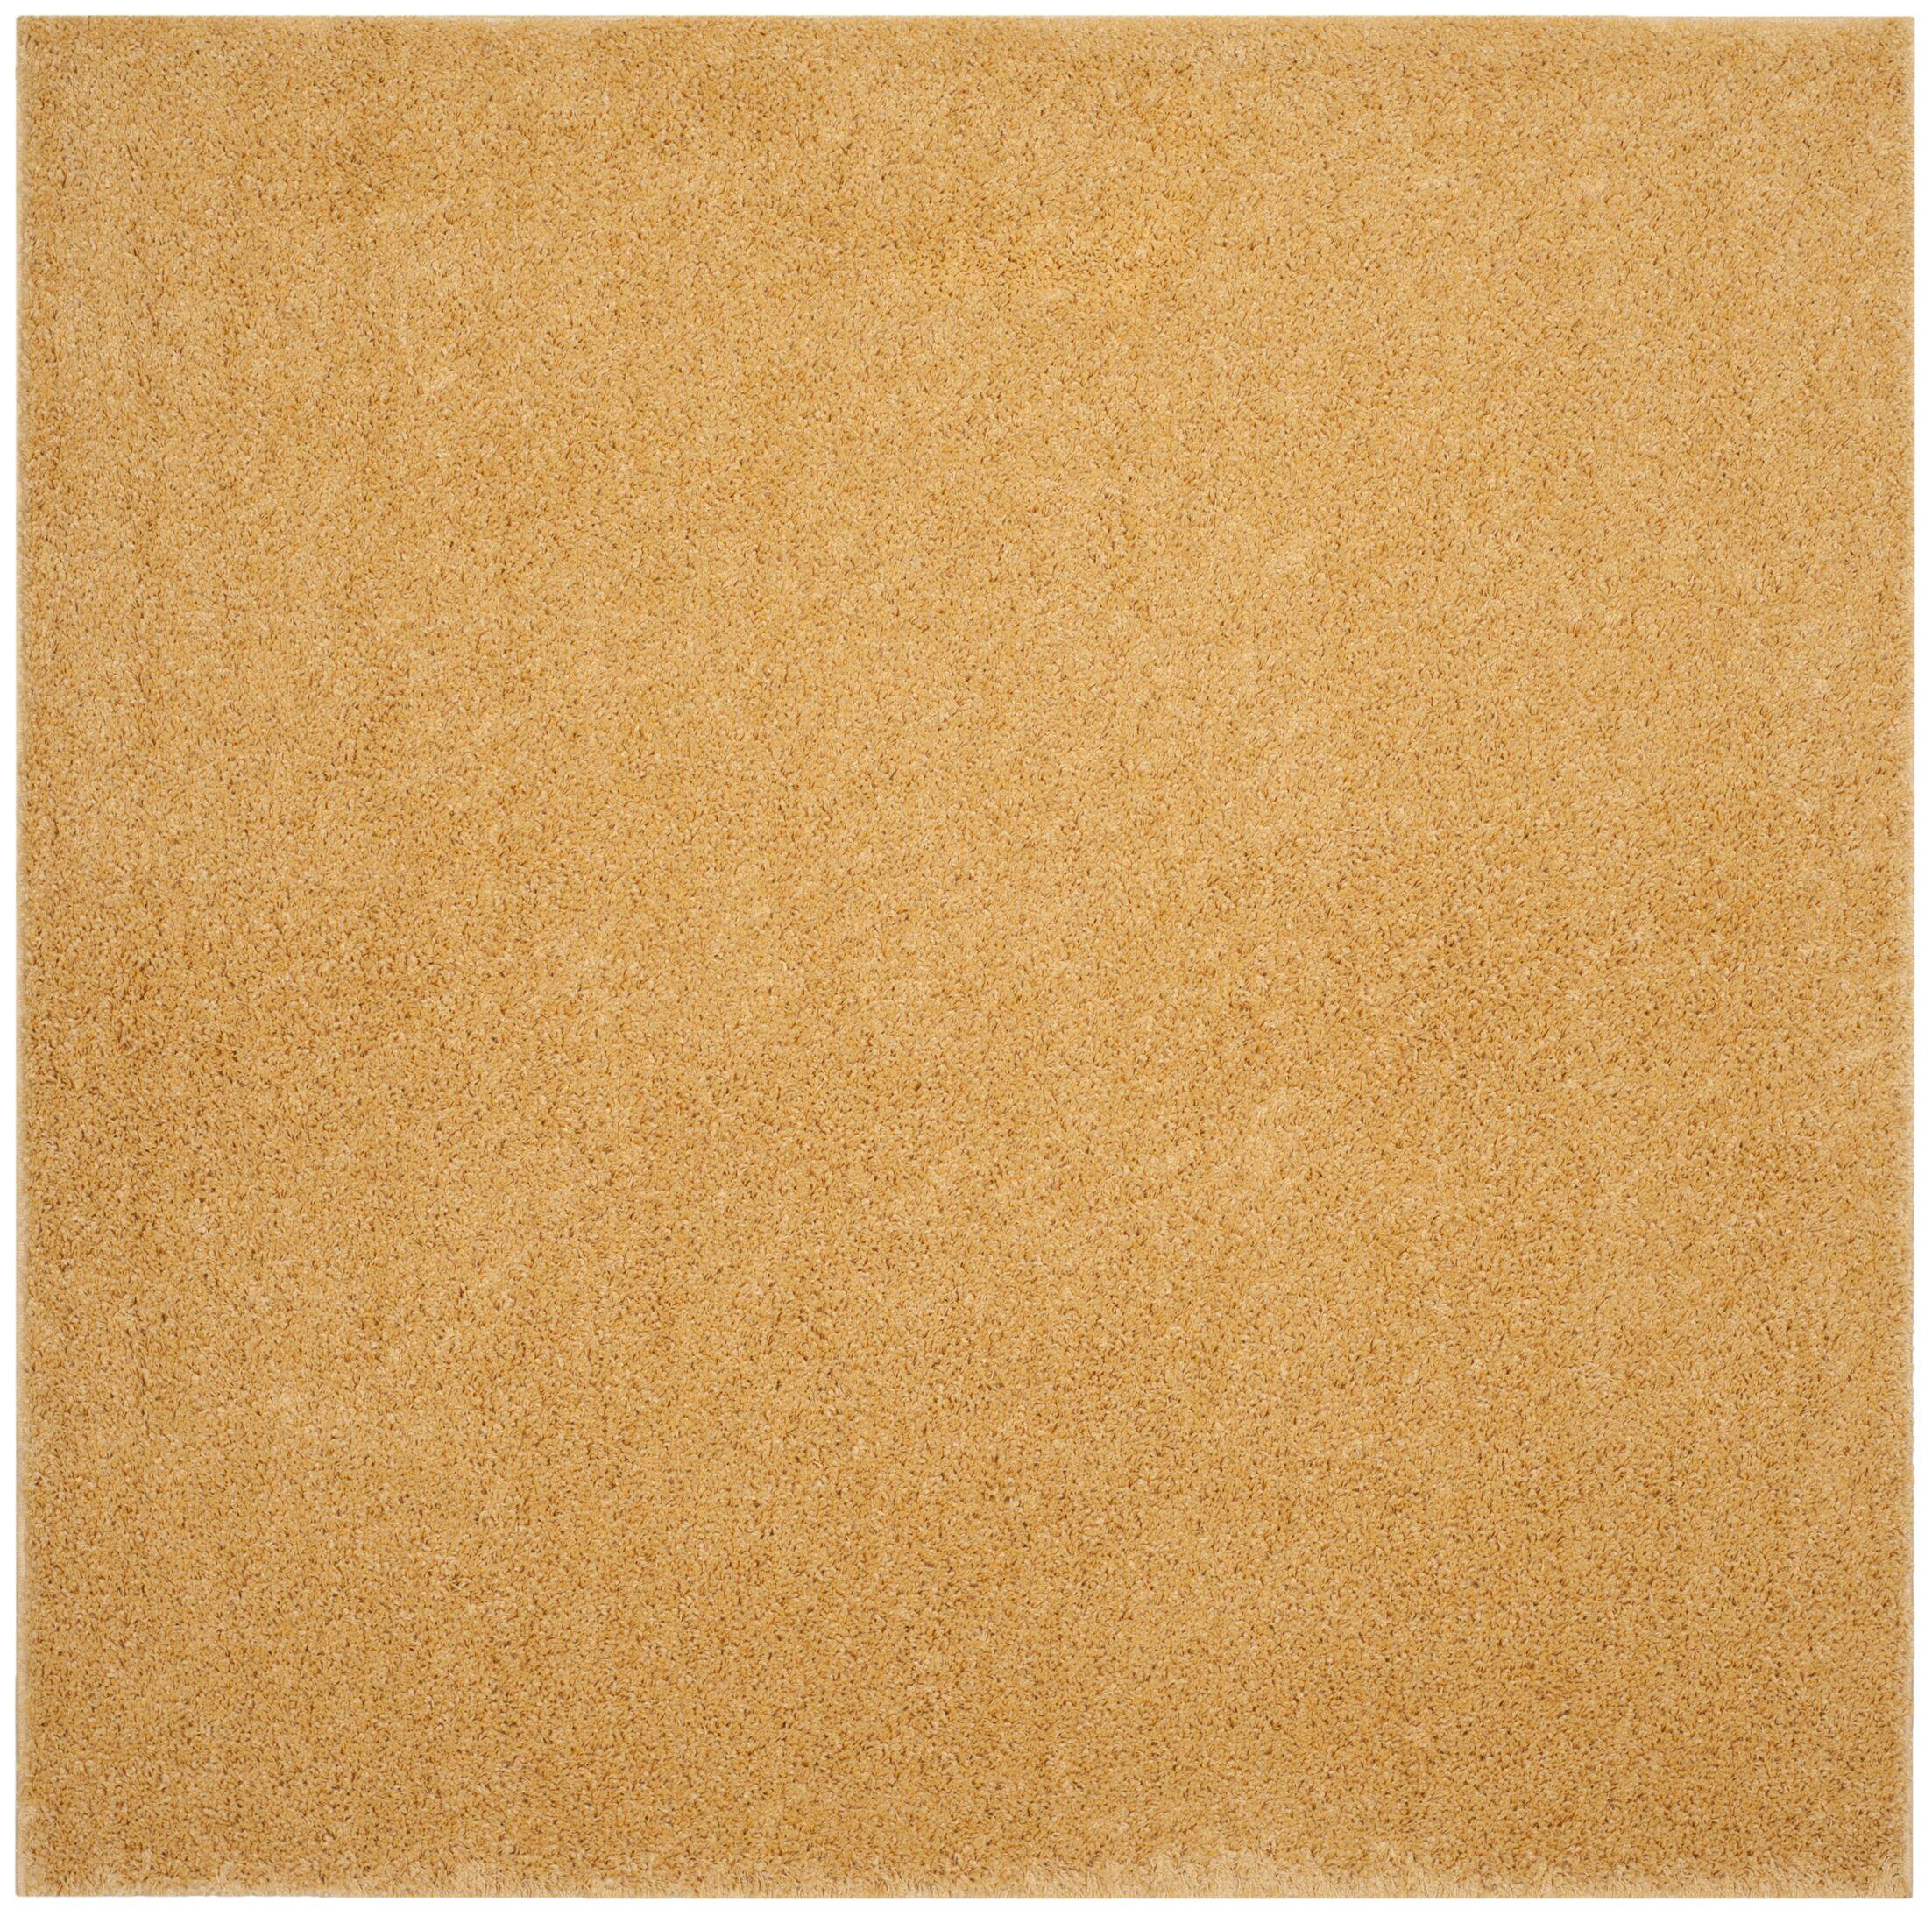 Curran Shag Gold Area Rug Rug Size: Square 6'7